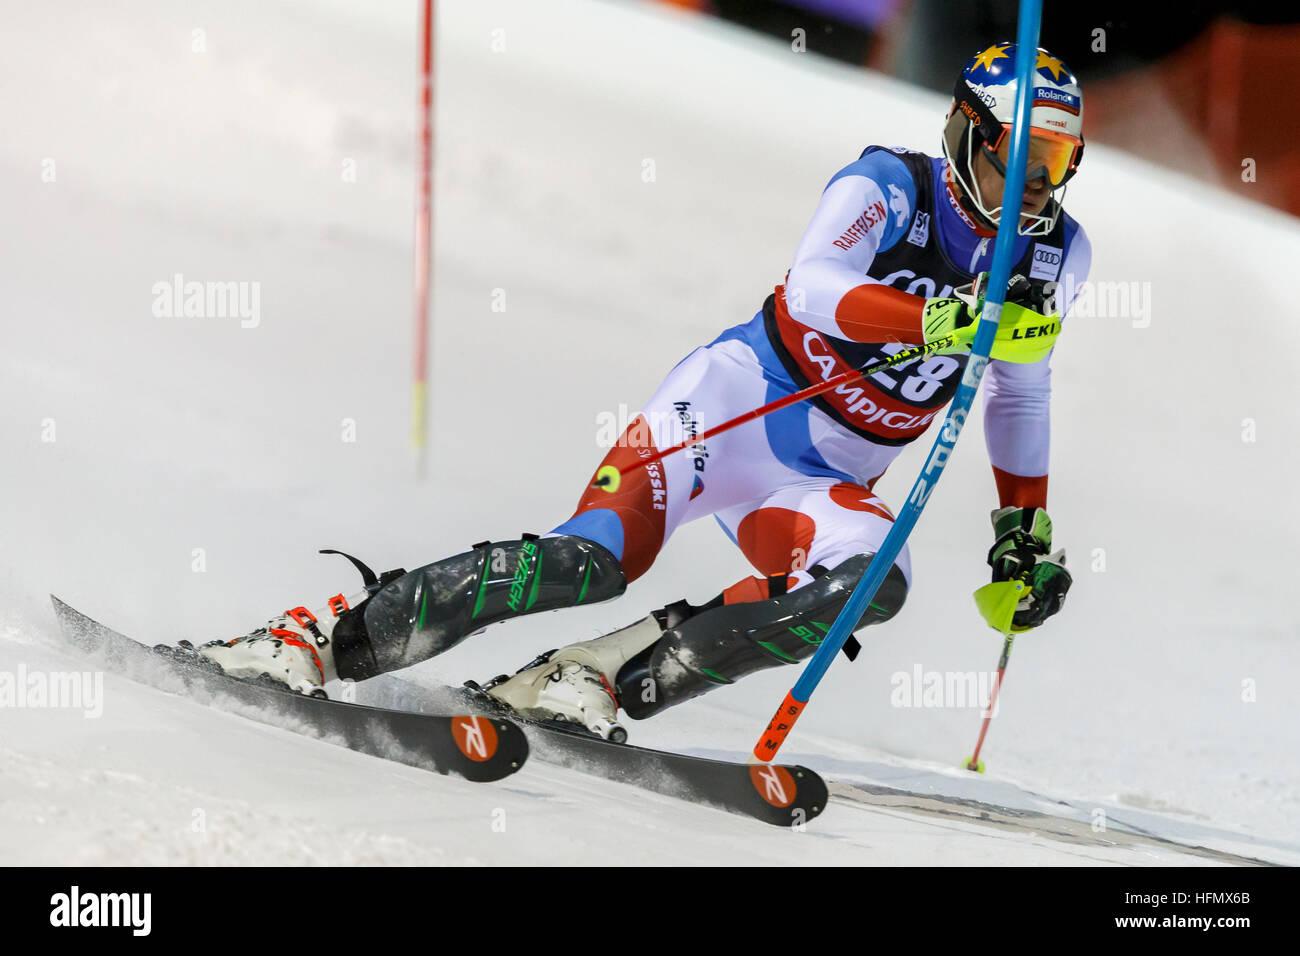 Madonna di Campiglio, Italy 22 December 2016.  ZENHAEUSERN Ramon (Swi) competing in the Audi Fis Alpine Skiing World - Stock Image